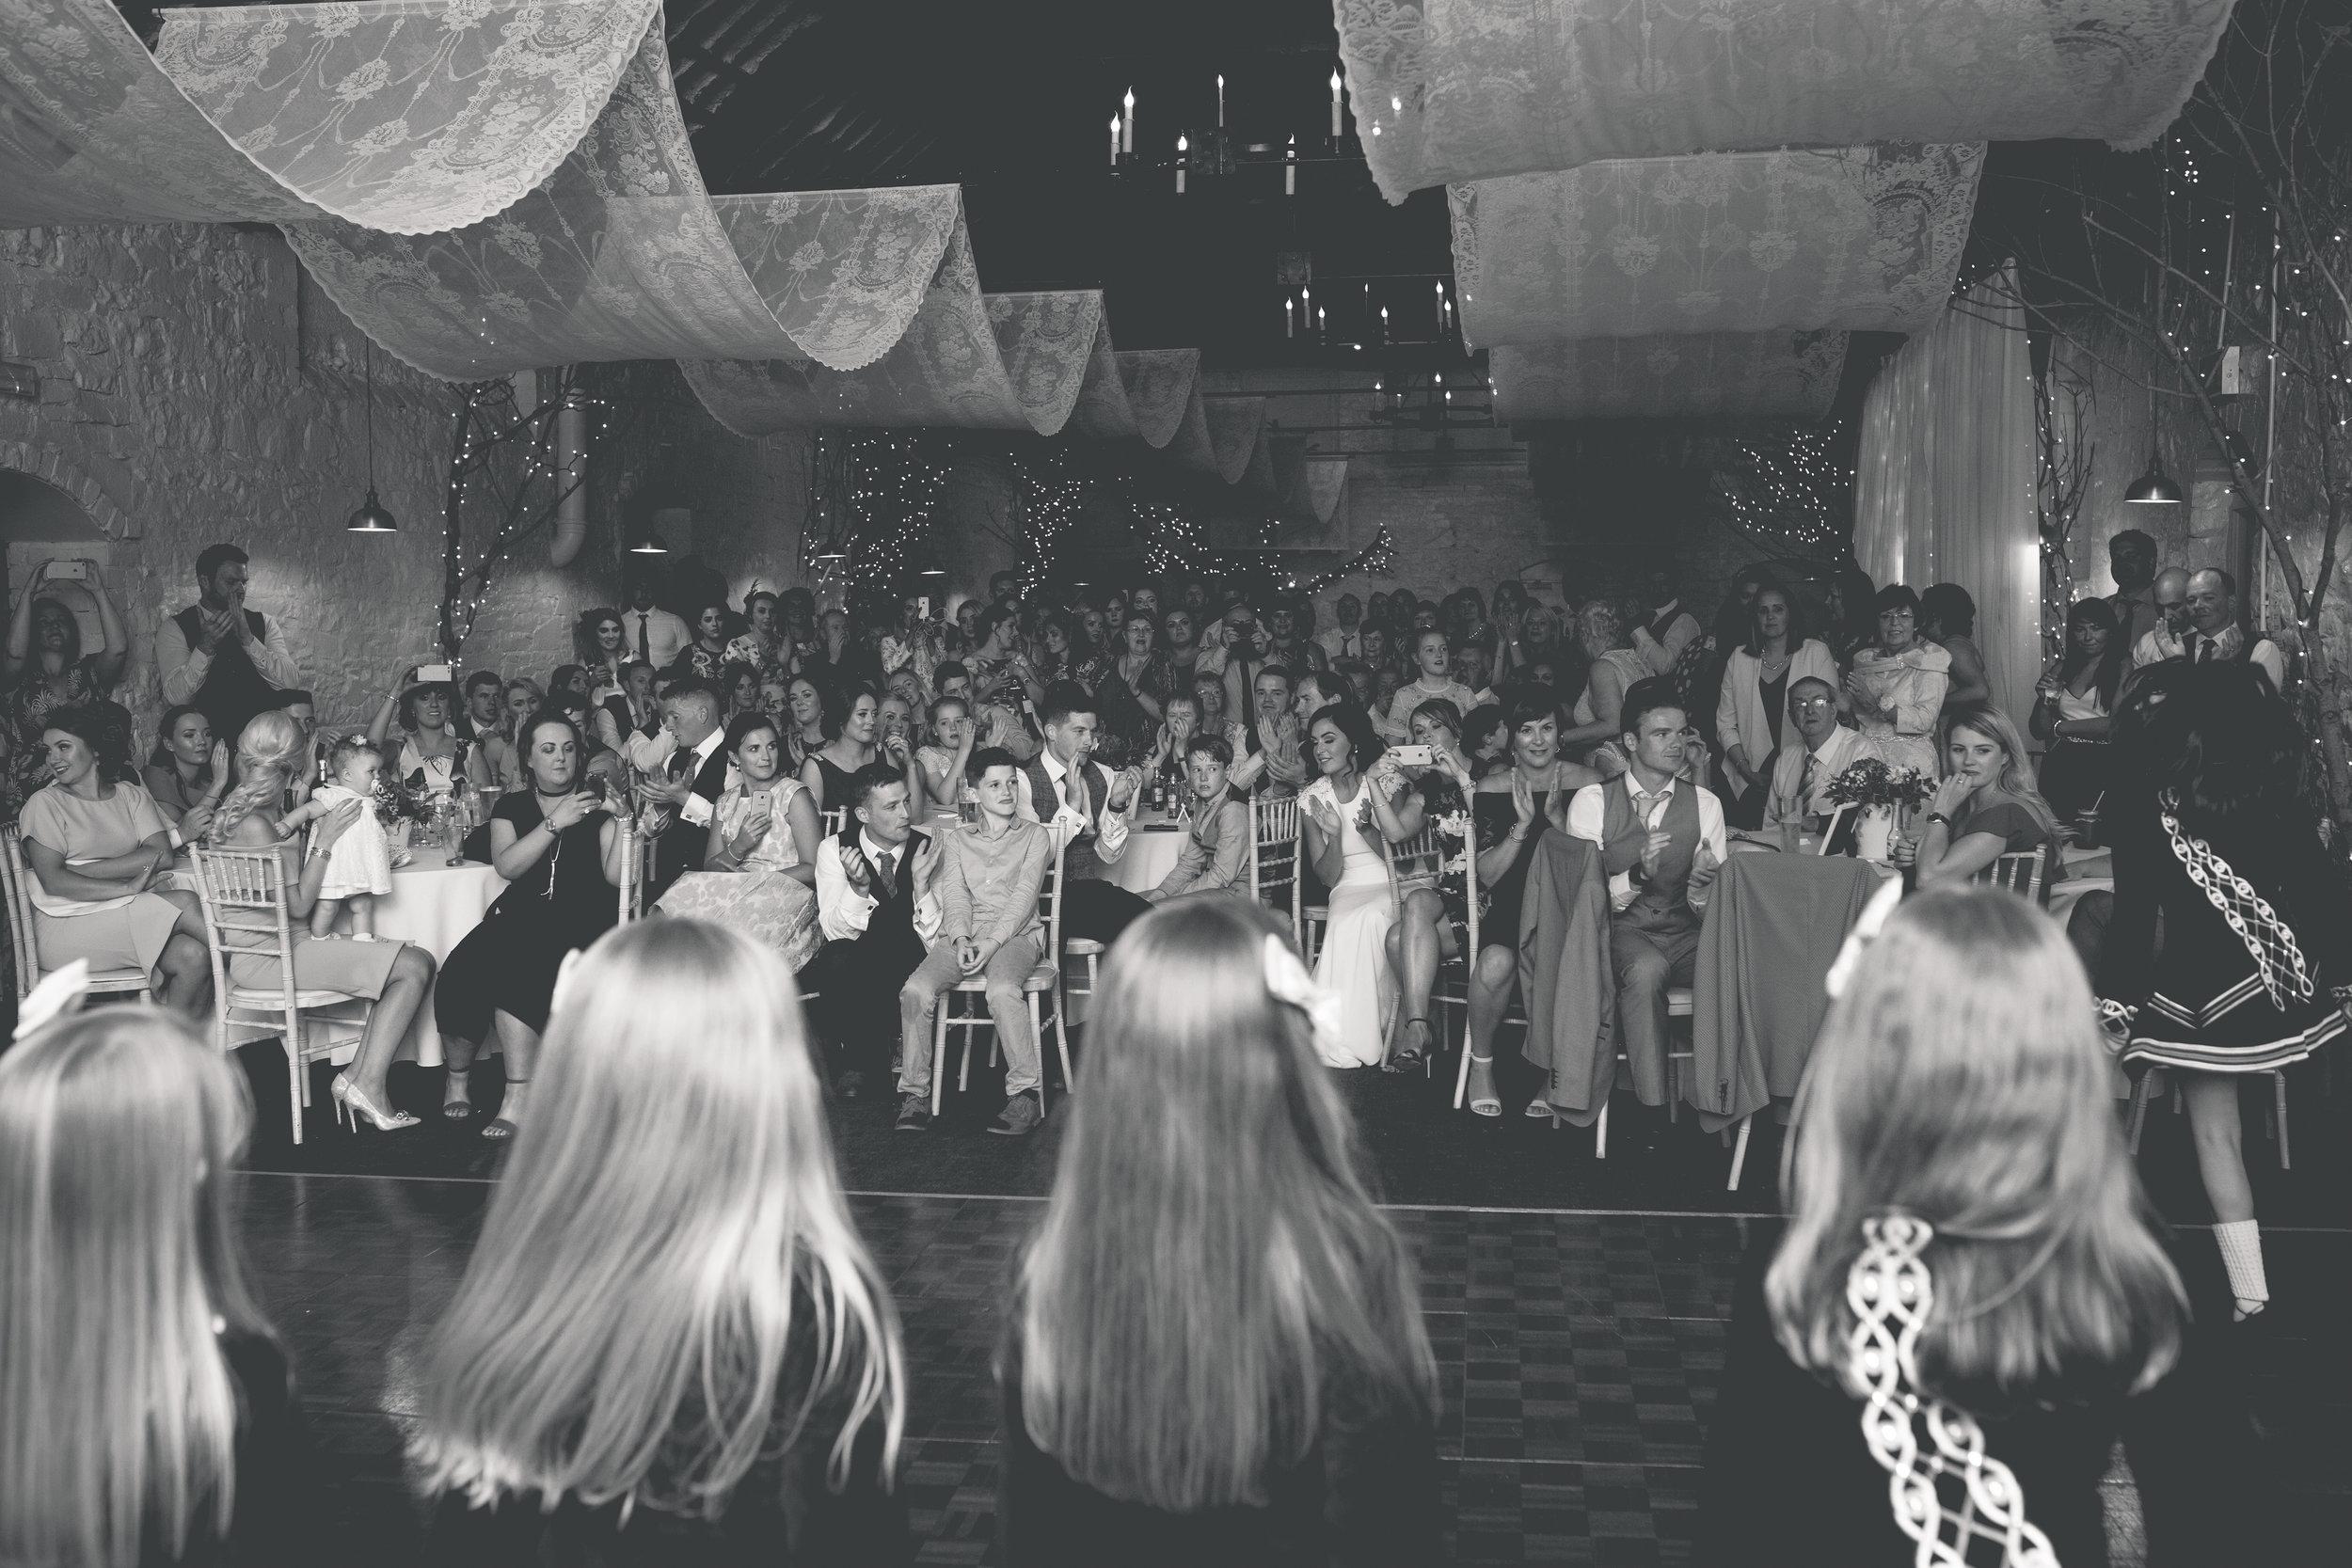 Brian McEwan Wedding Photography | Carol-Annee & Sean | The Dancing-7.jpg